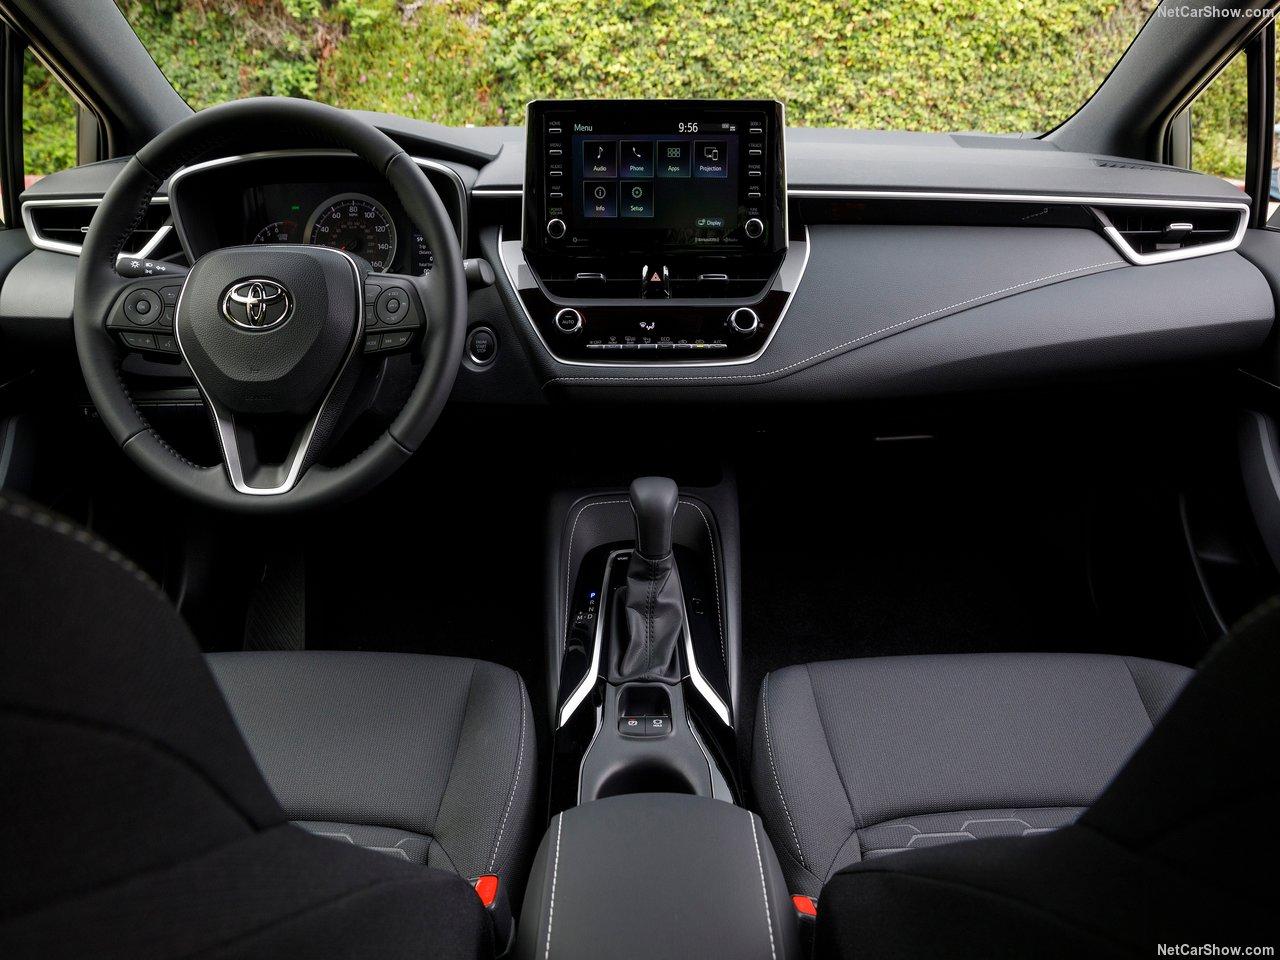 Toyota-Corolla_Hatchback-2019-1280-29_20180520010026312.jpg